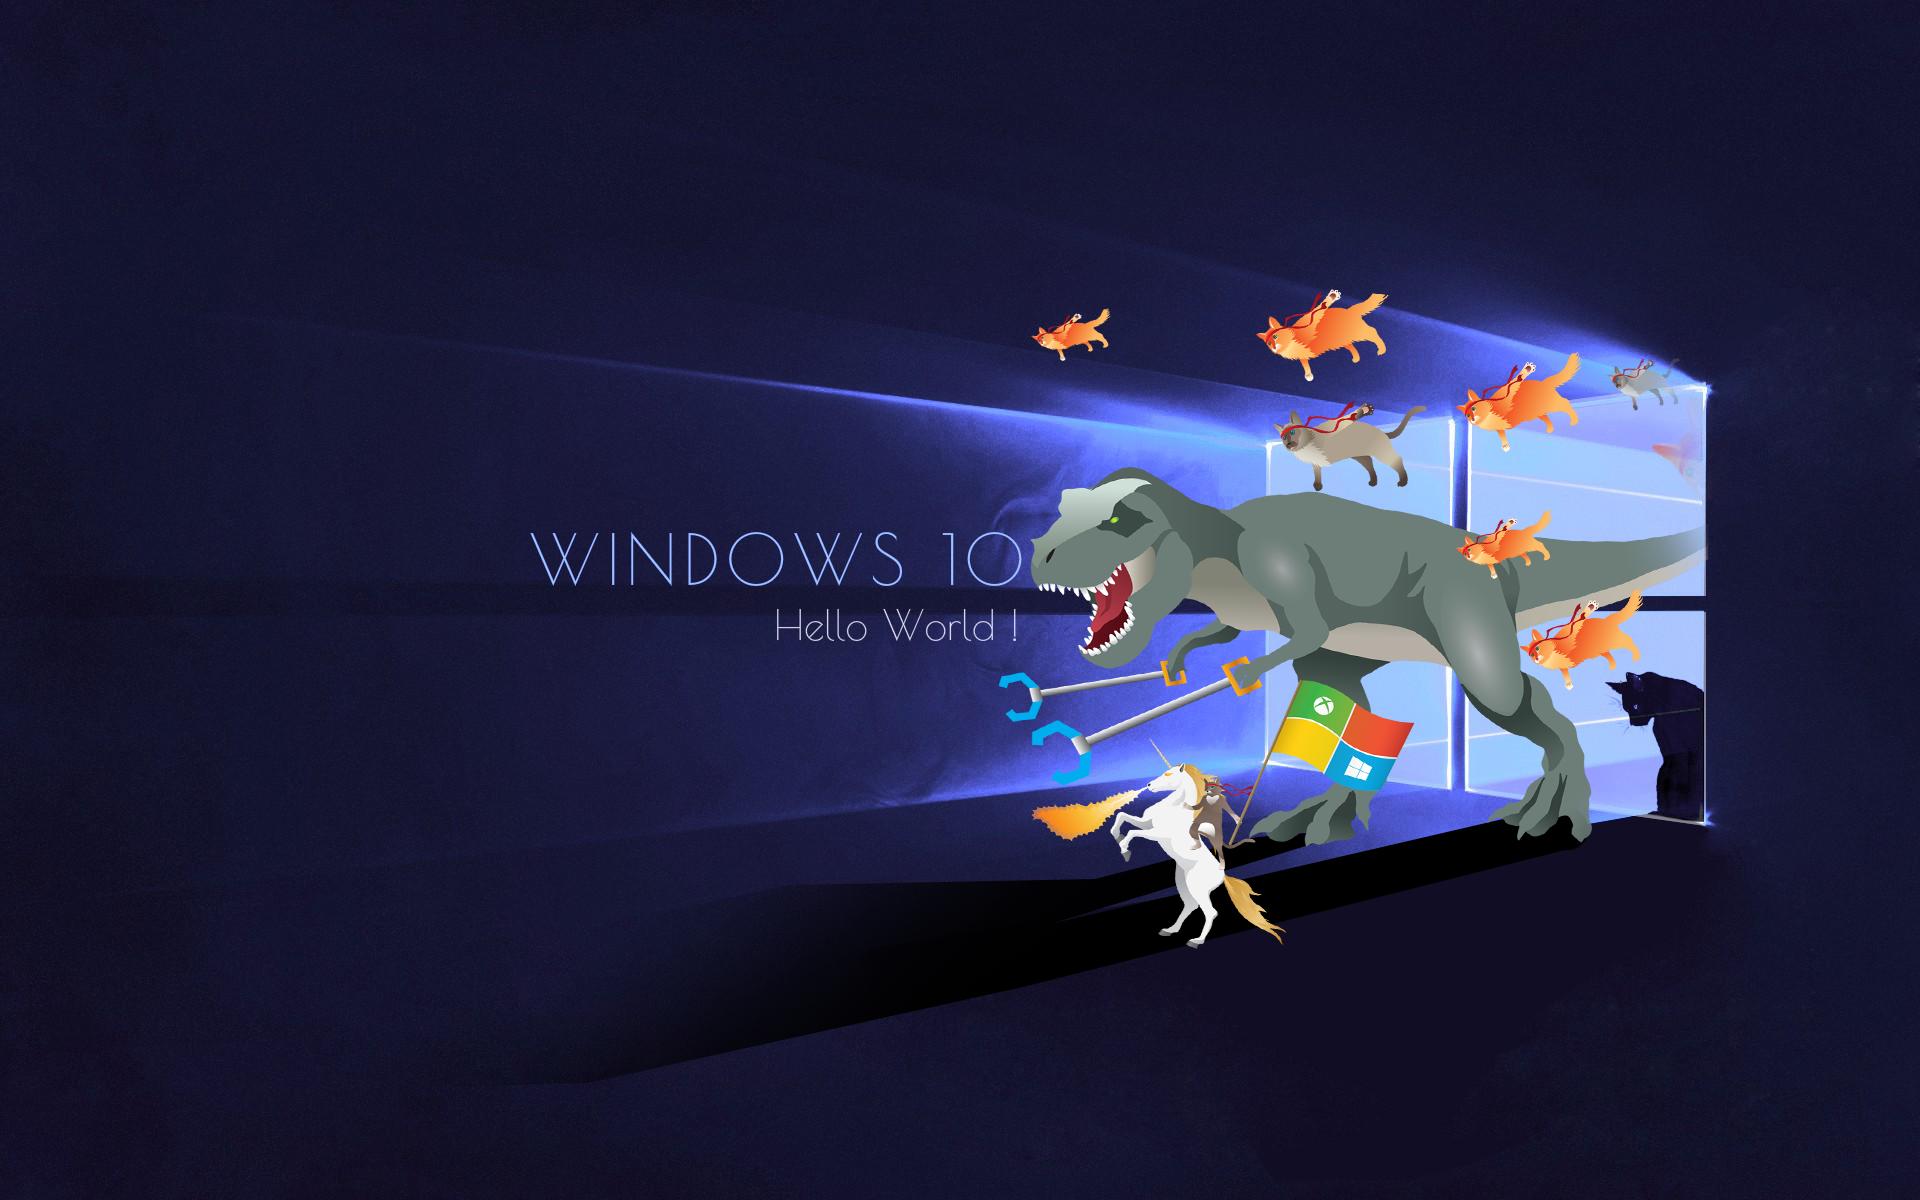 Windows Insider Wallpaper T Rex - WallpaperSafari